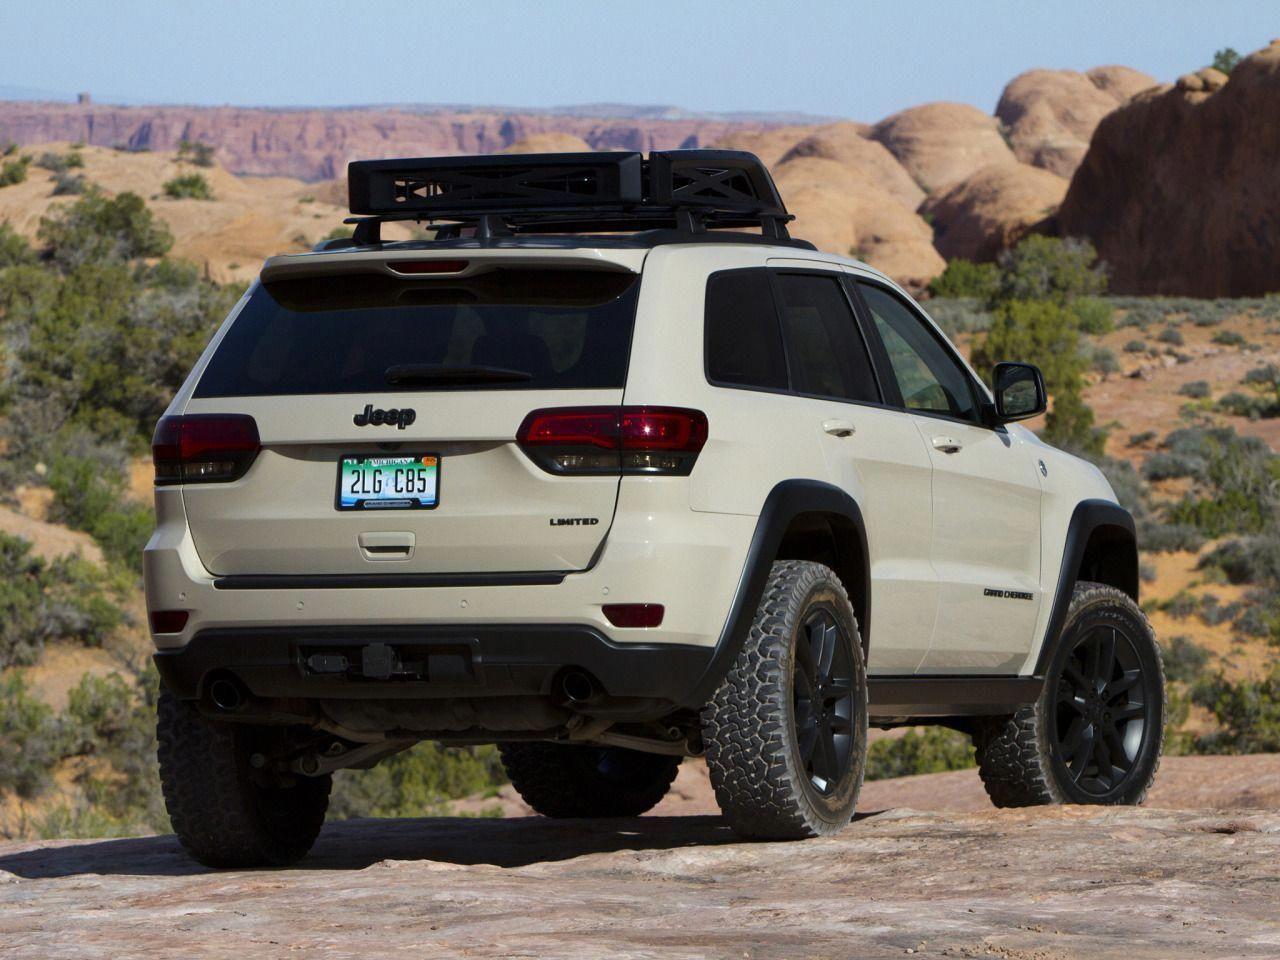 Tactical Lifestyle Fullthrottleauto Jeep Grand Cherokee Trail Vehicleinsurance Jeep Grand Cherokee Jeep Grand Jeep